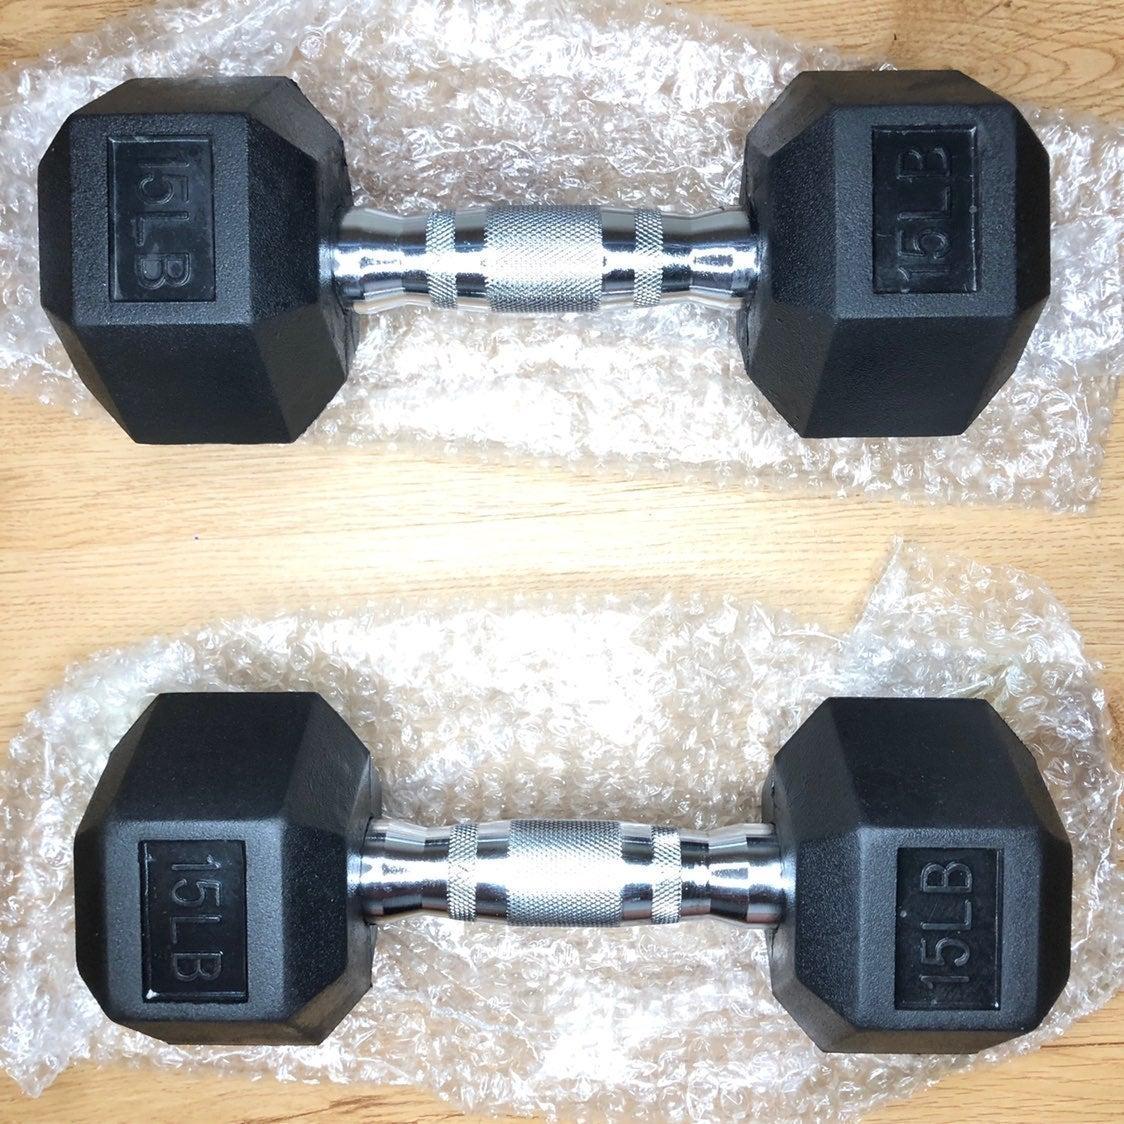 15 pound hex coated dumbell set